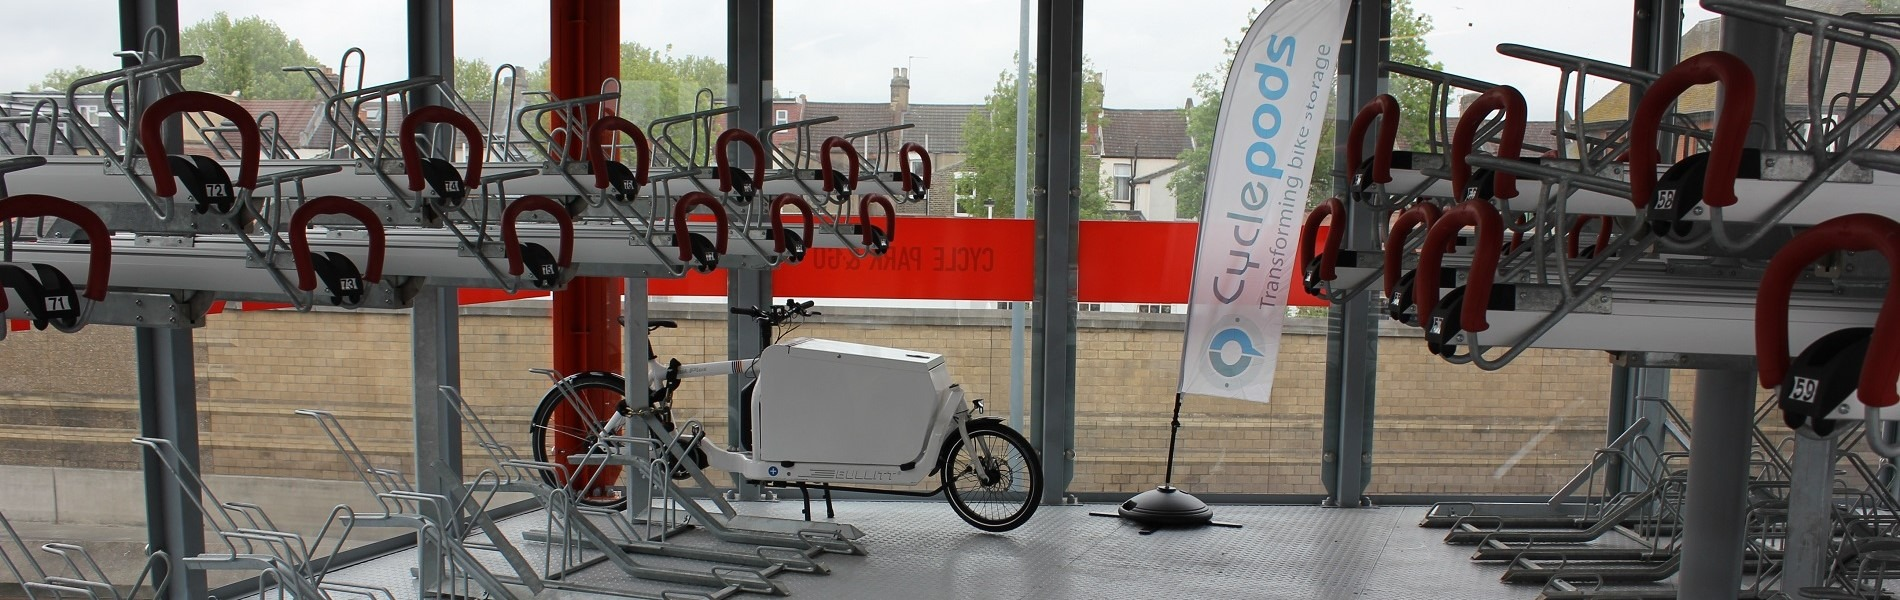 Leyton Cycle Hub